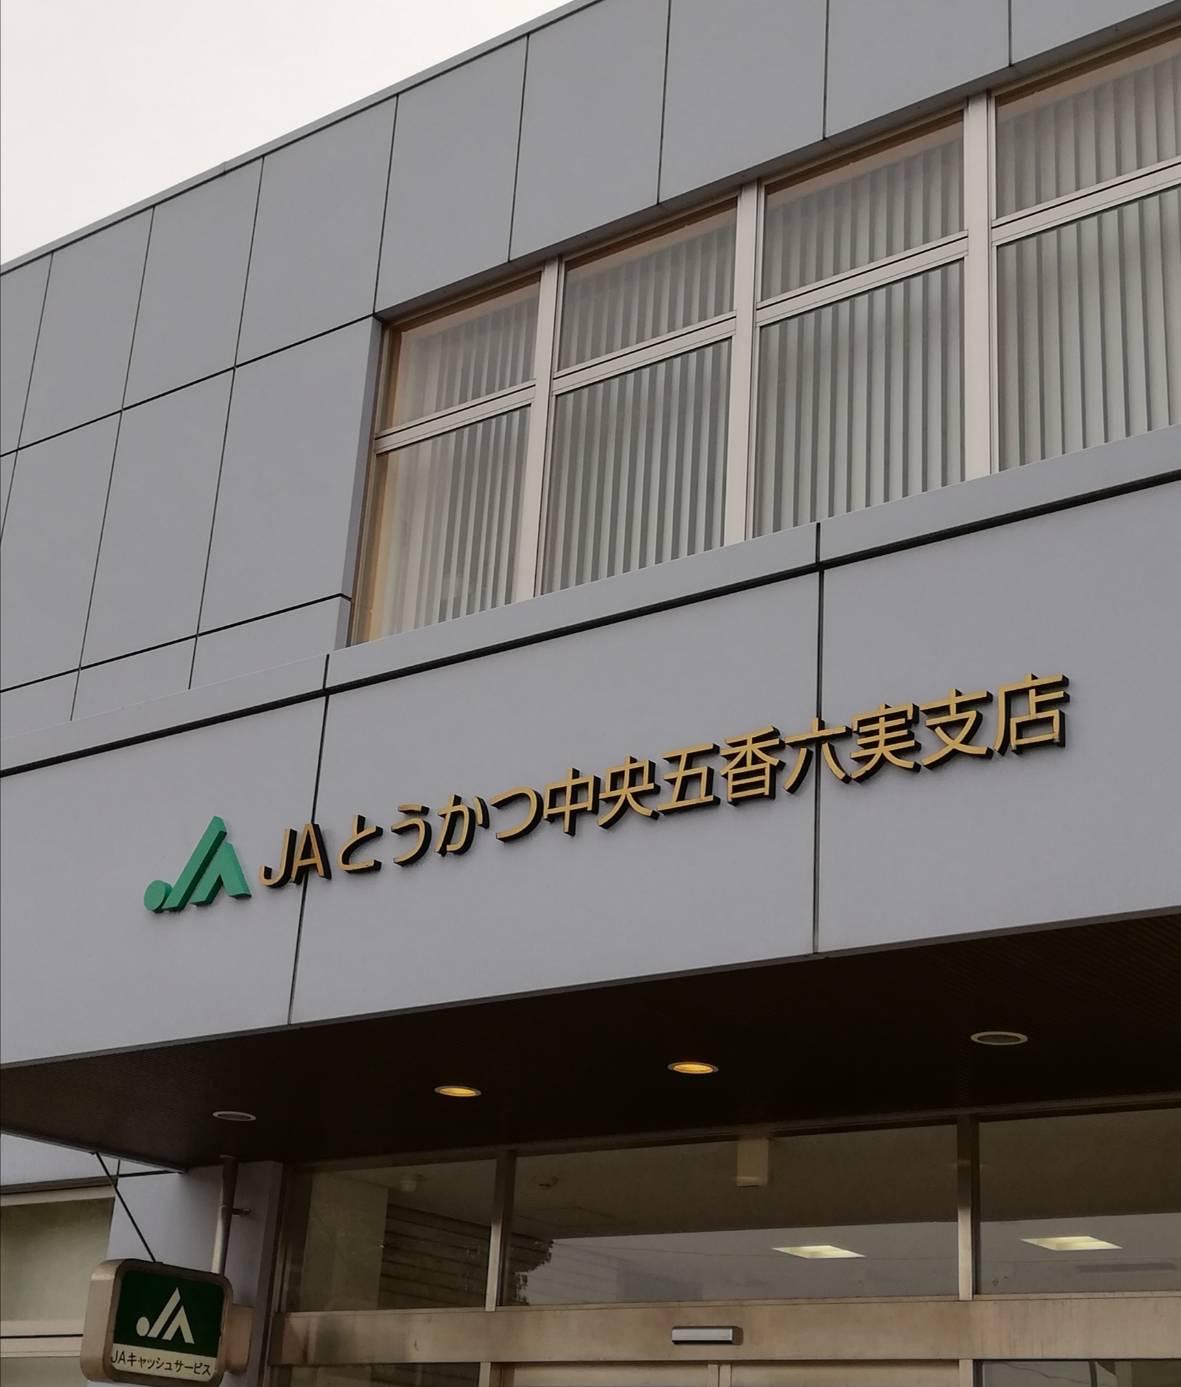 JAとうかつ中央五香六実支店ATM店舗